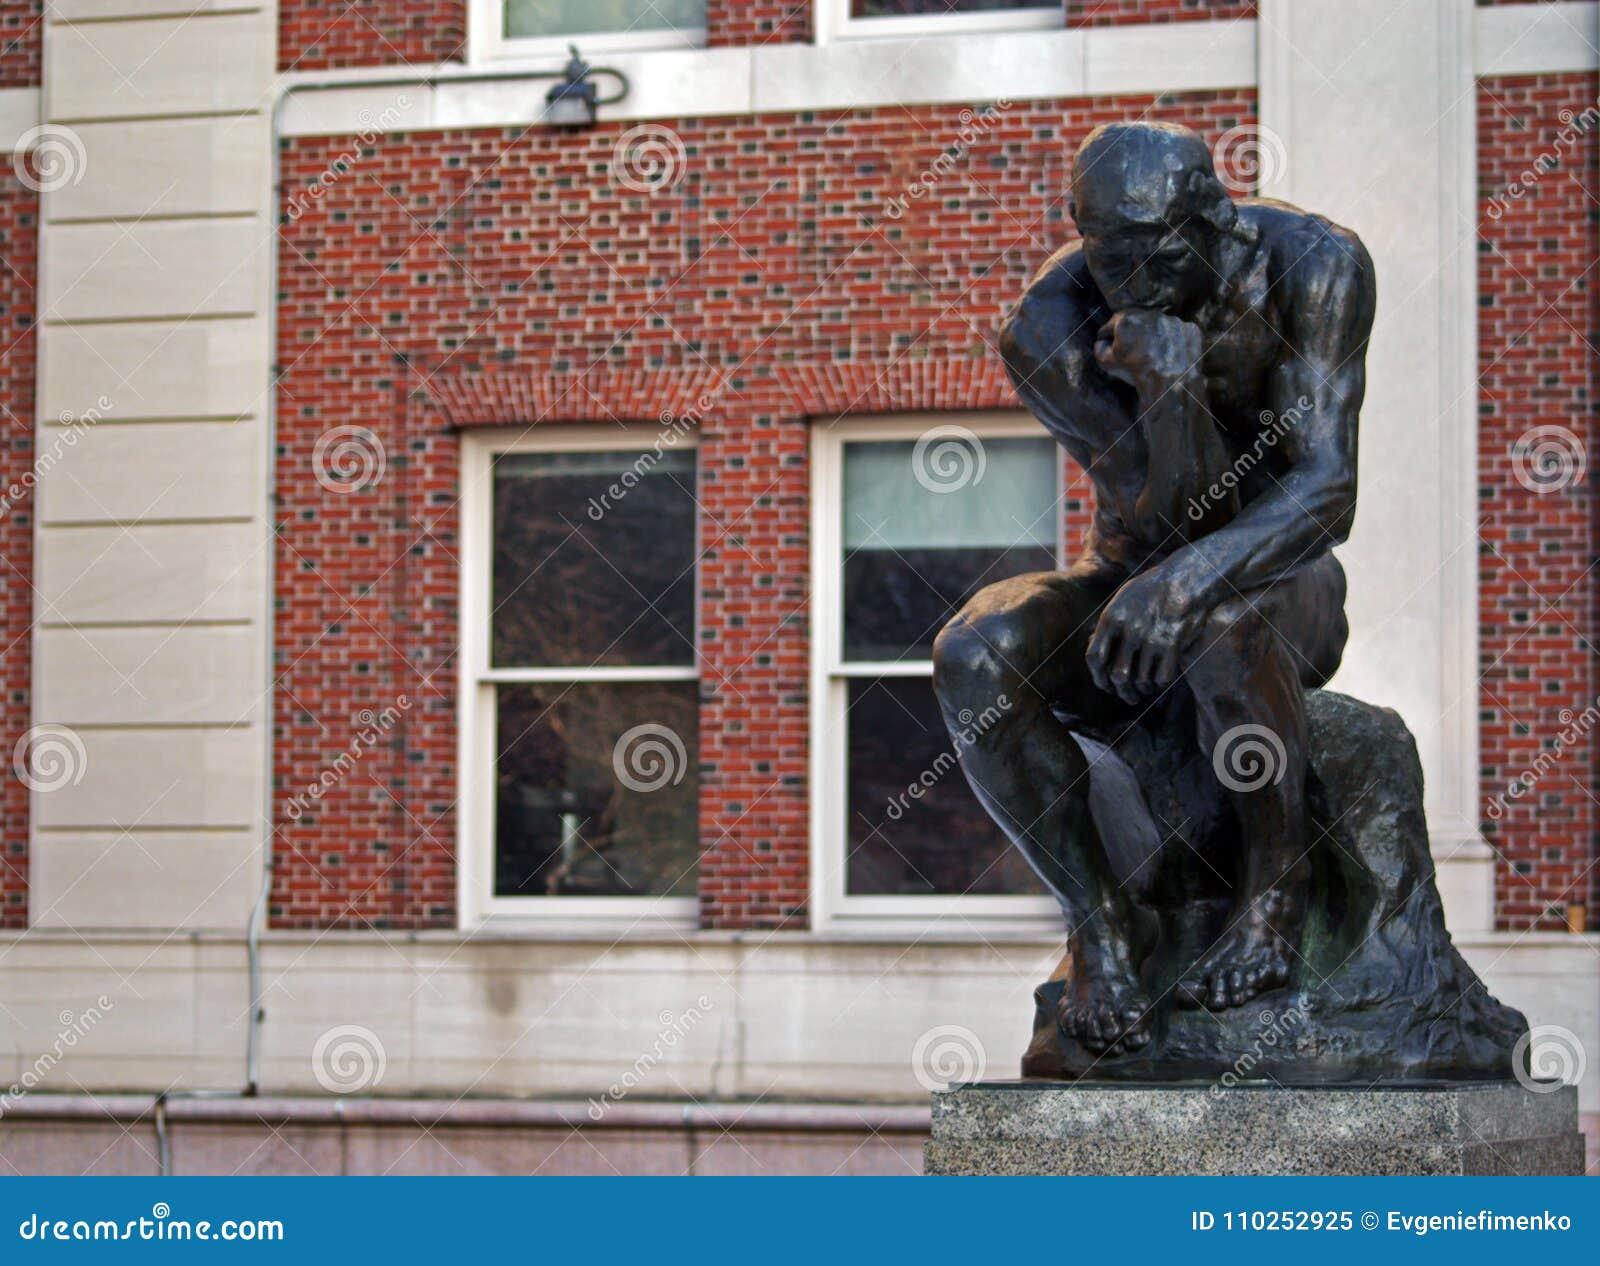 O pensador na Universidade de Columbia